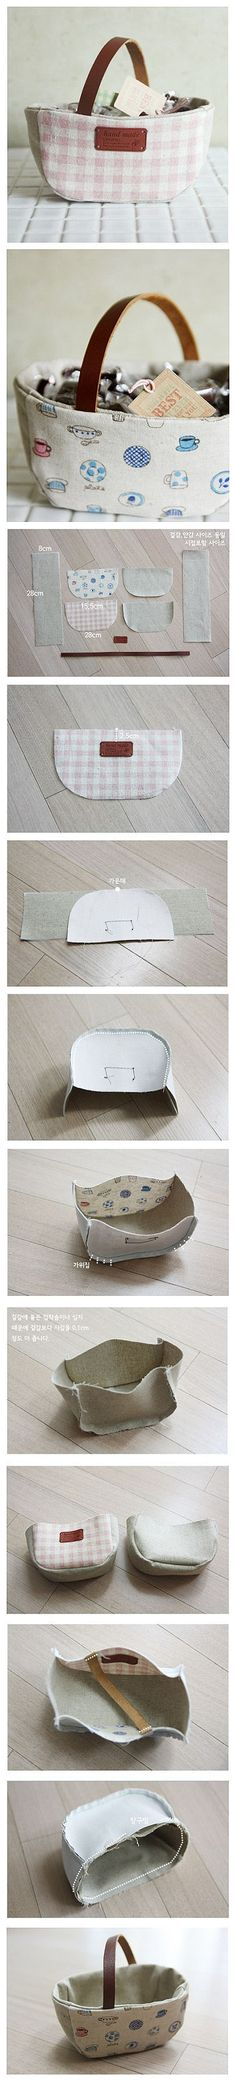 Fabric basket DIY